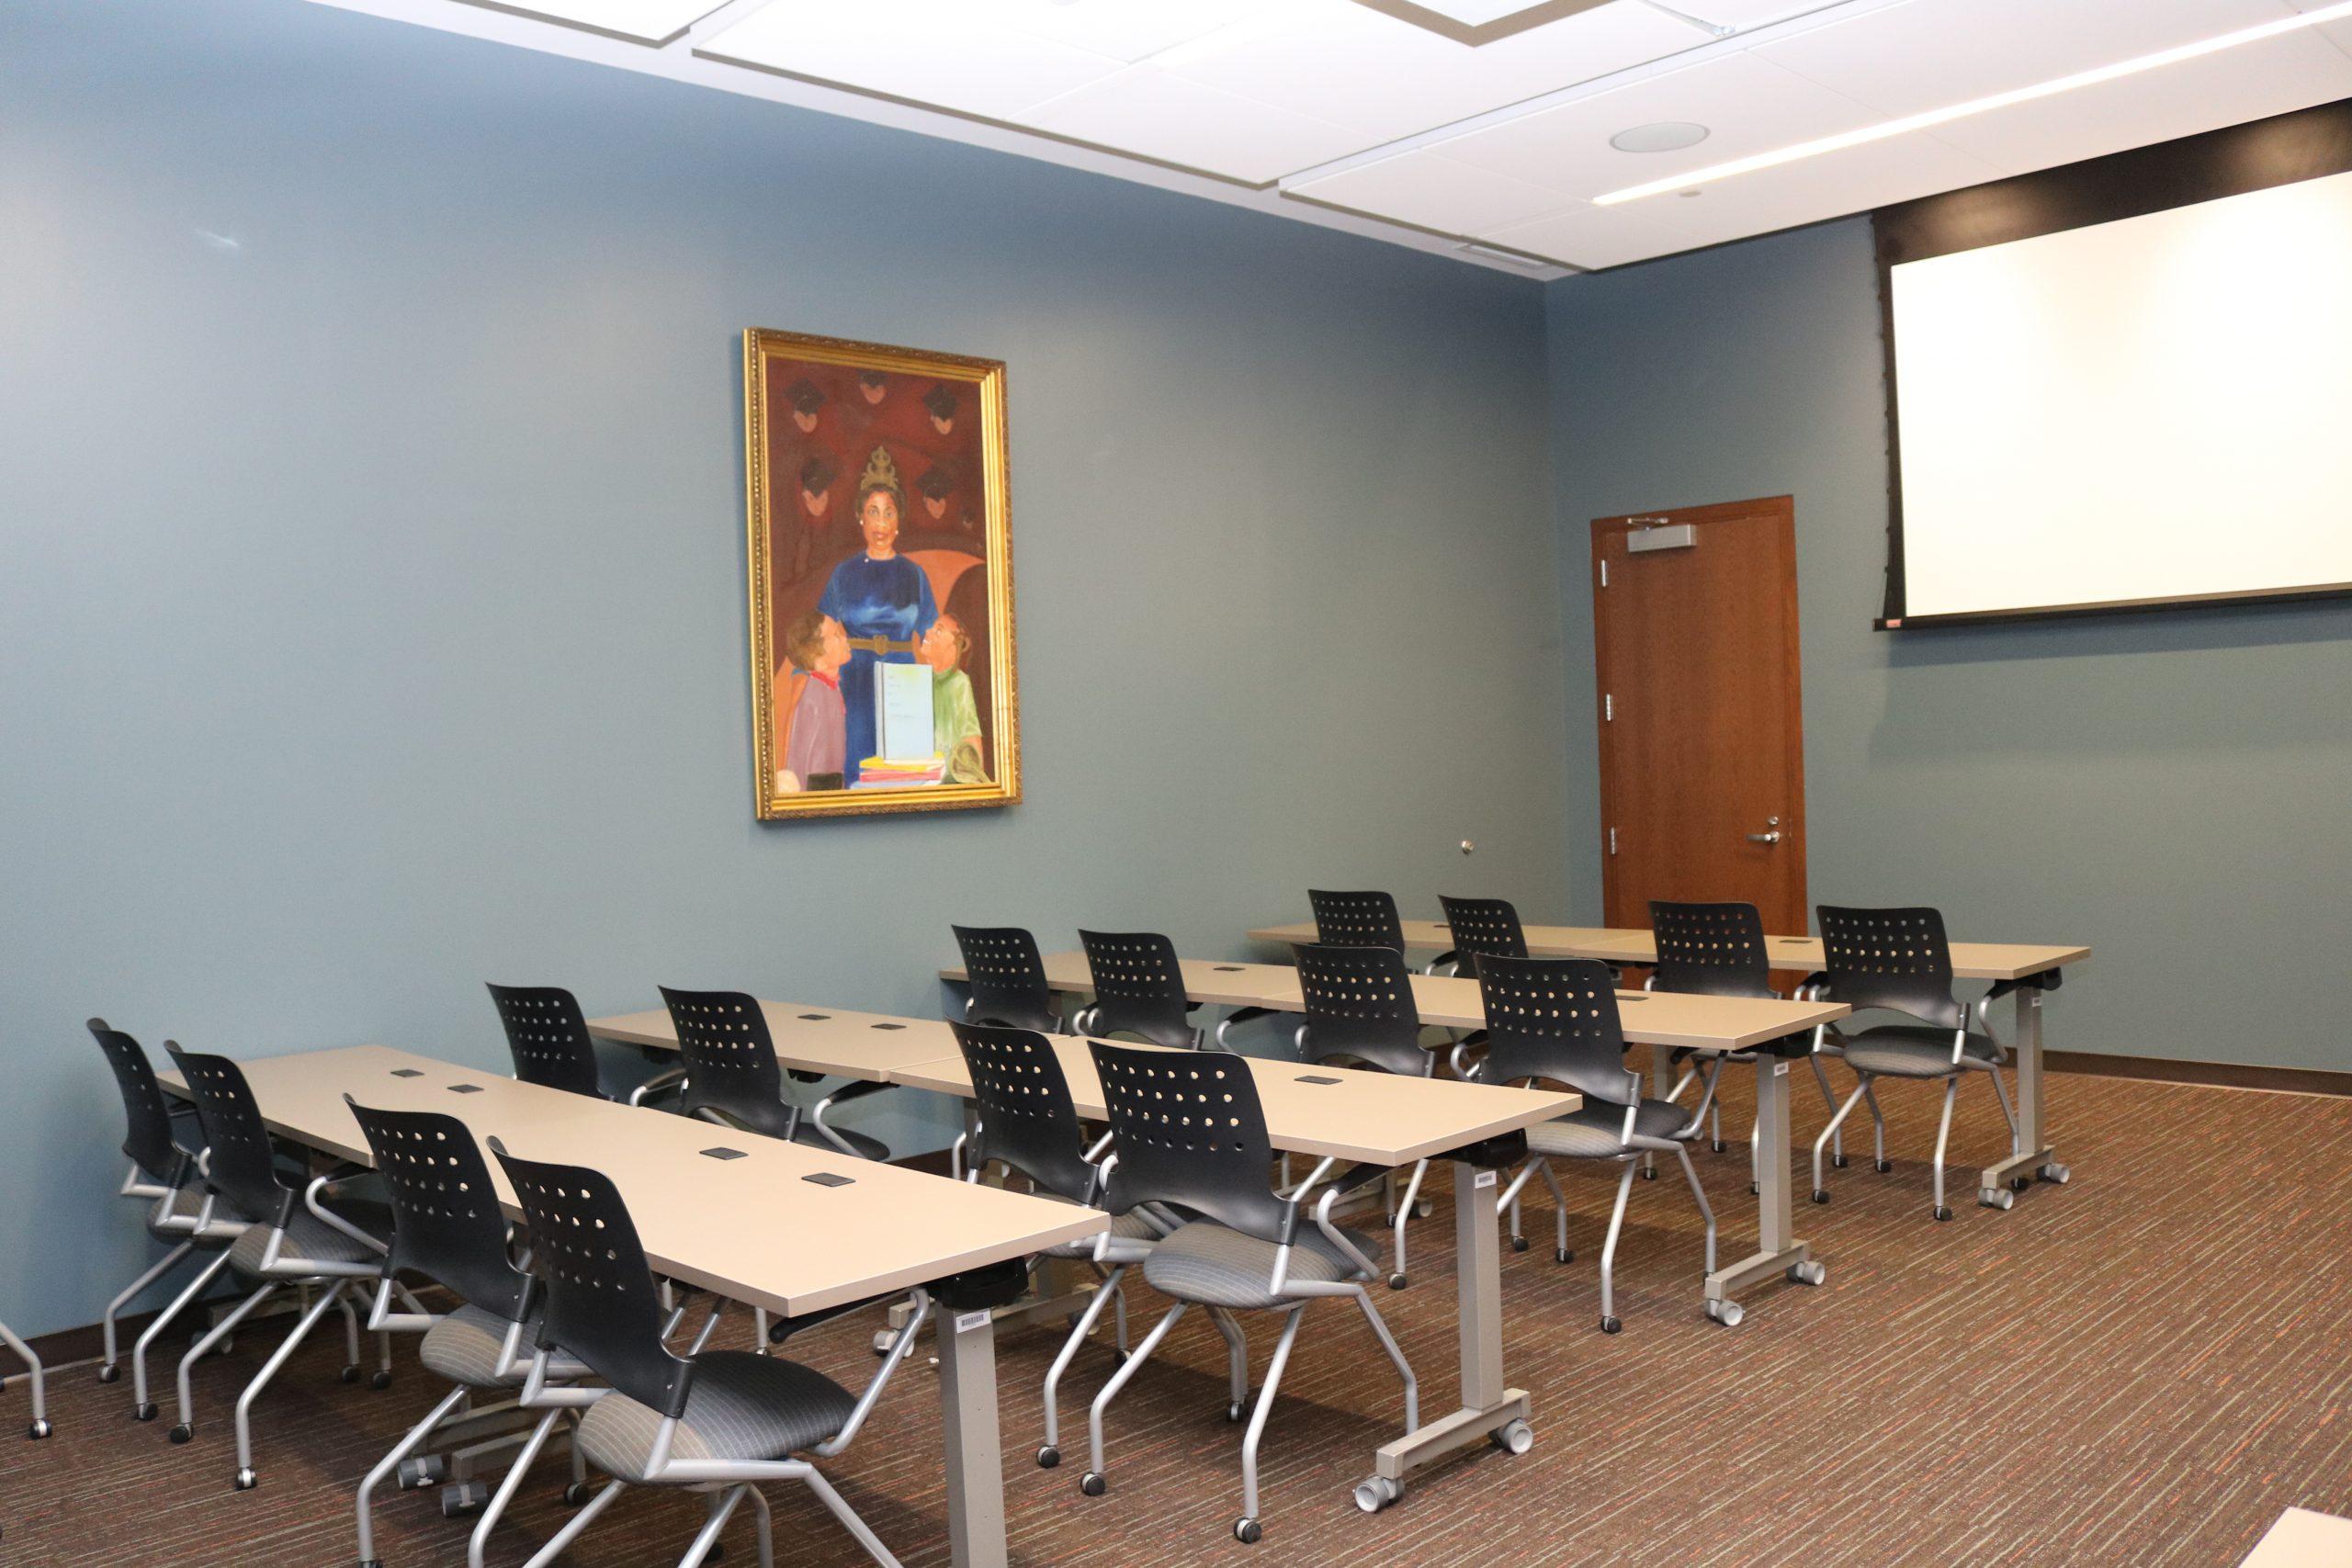 Heritage Education Center